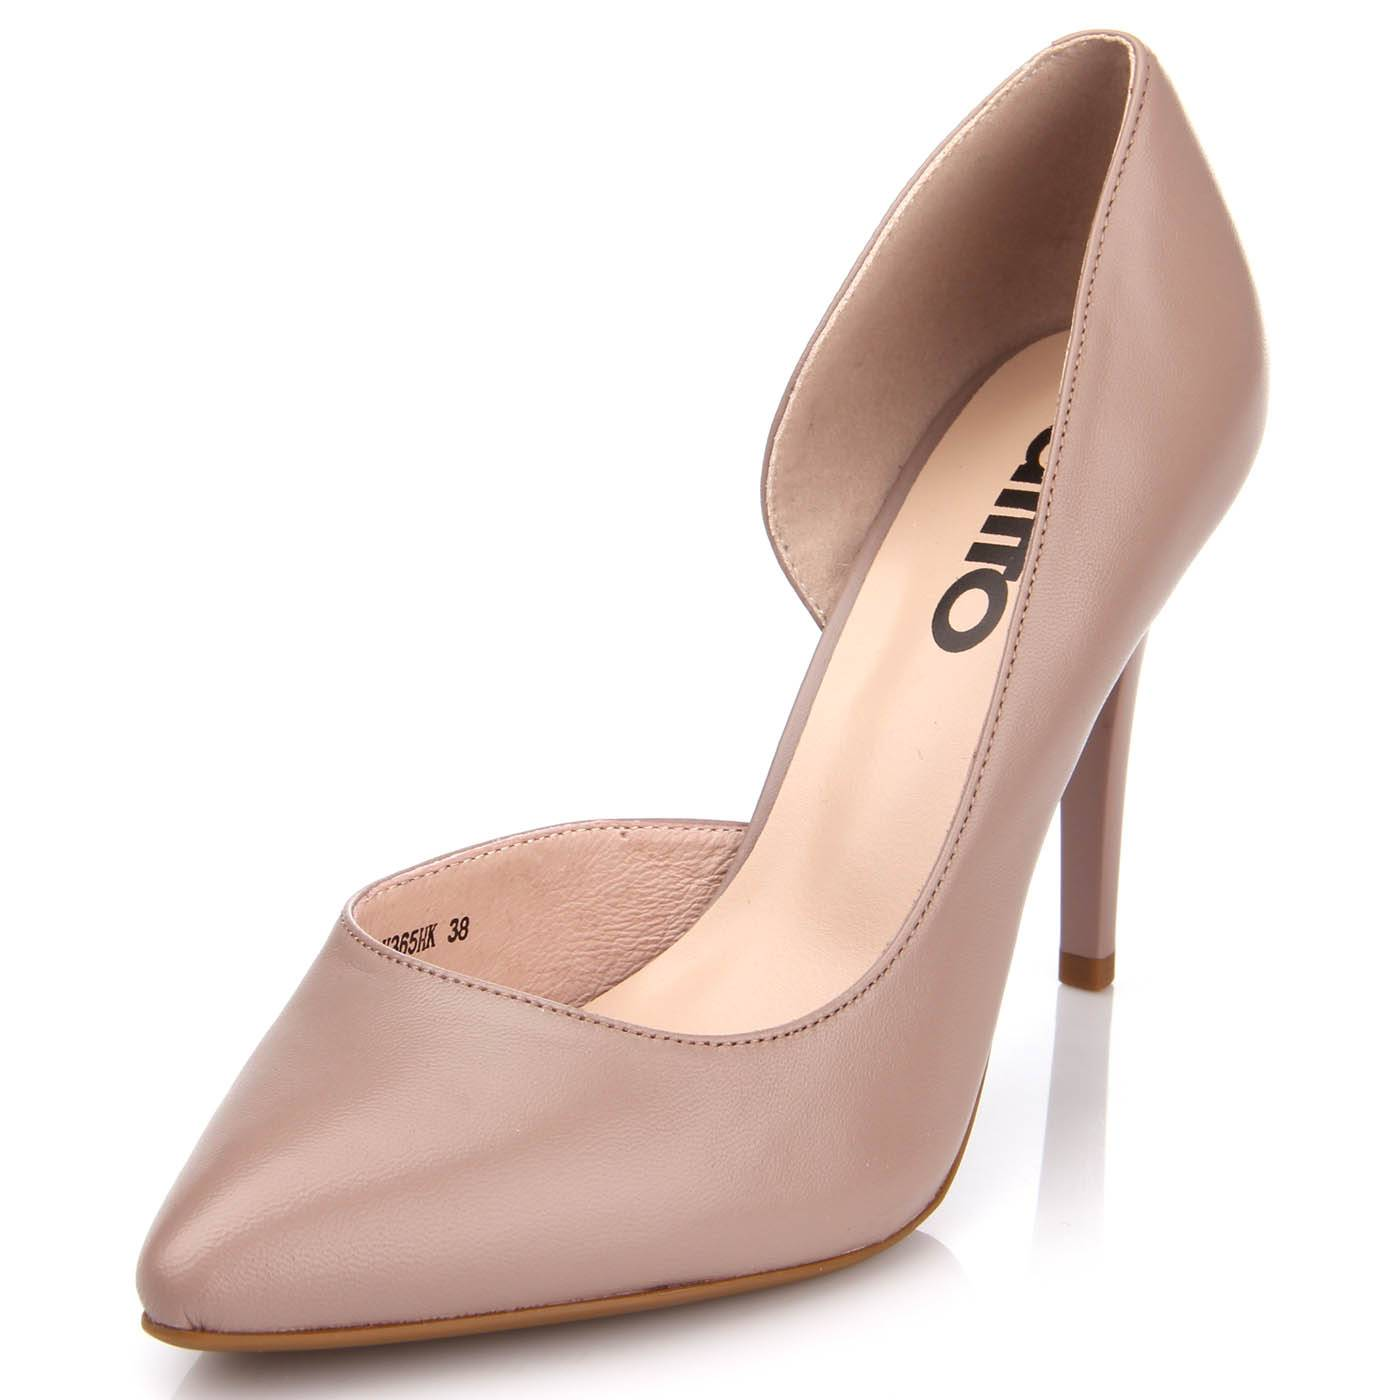 Туфлі жіночі ditto 6916 Сірий купить по выгодной цене в интернет ... 54ffef0bf5ac4